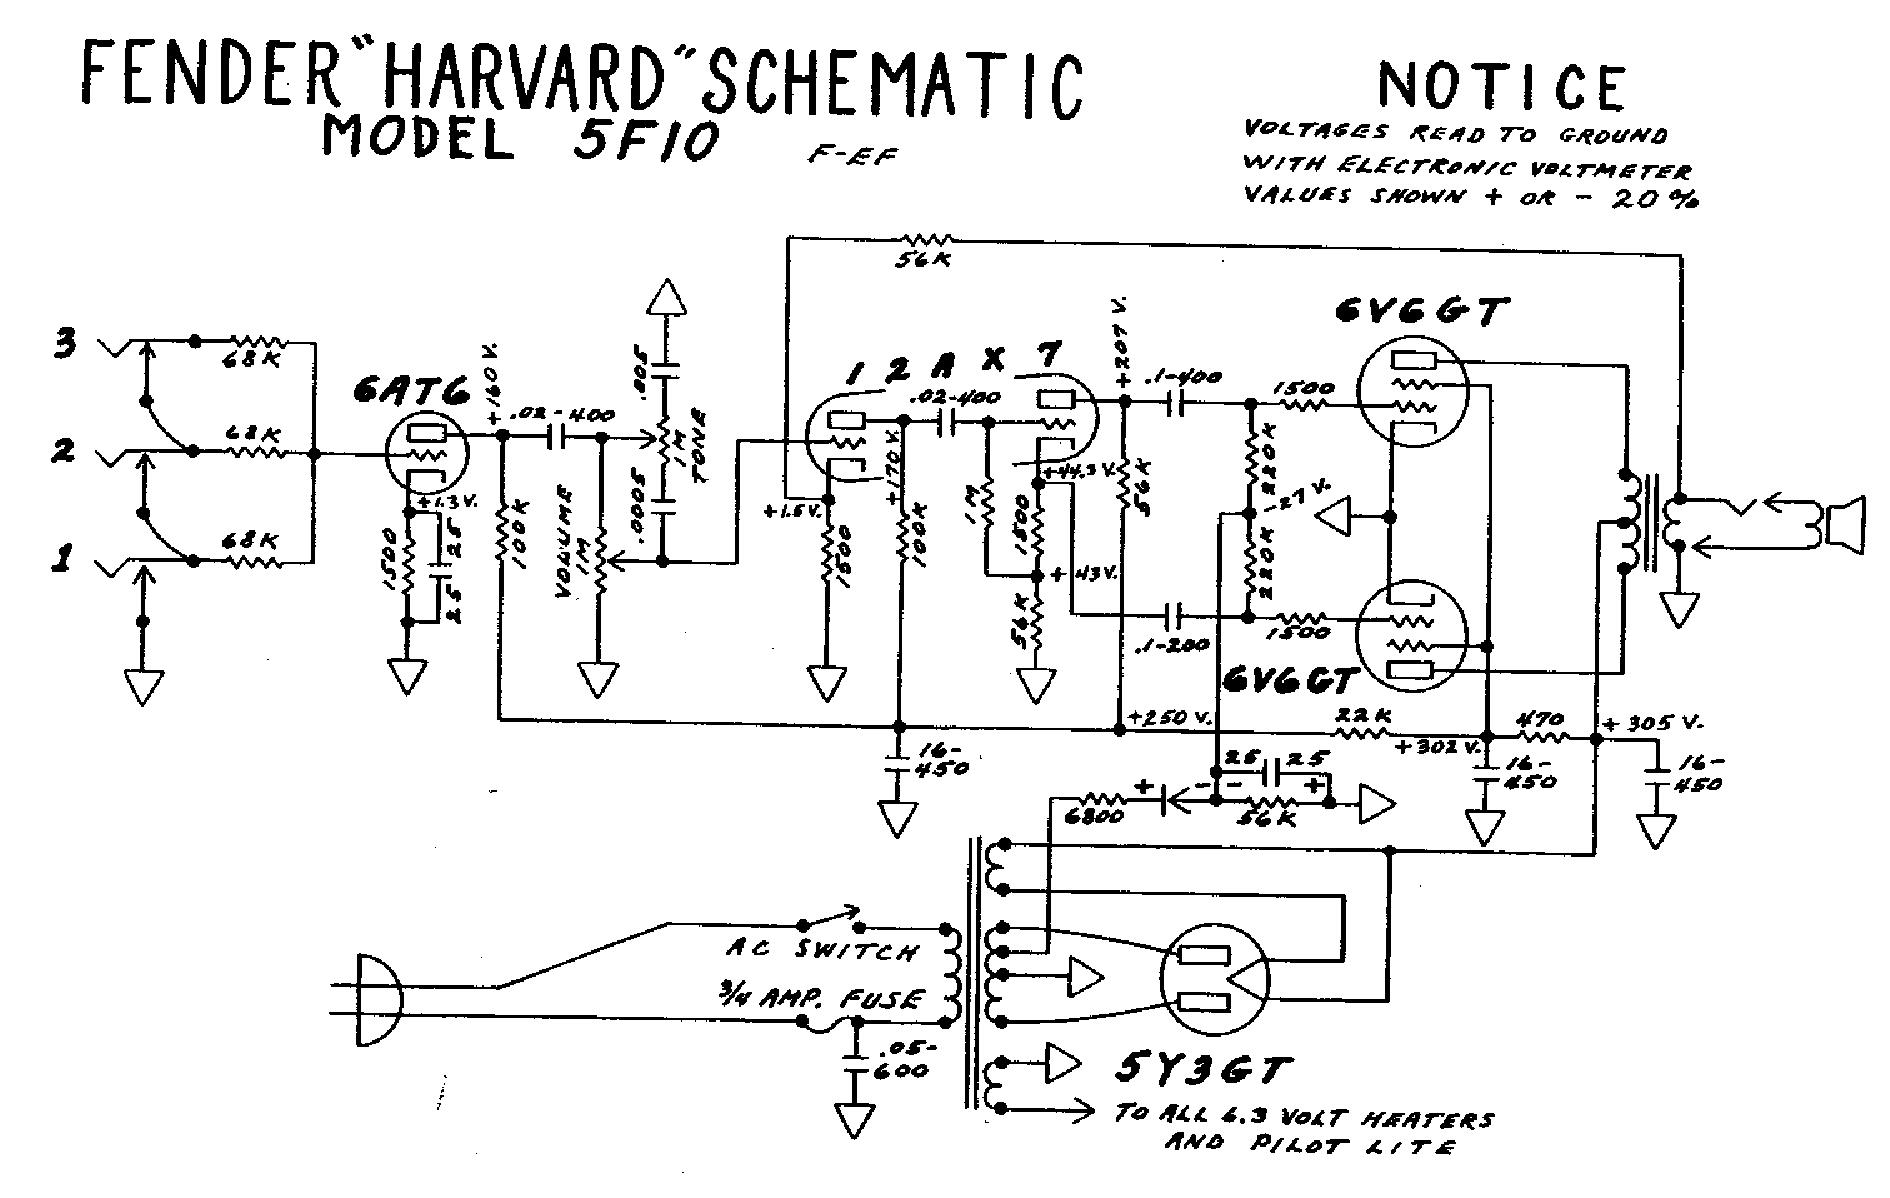 Fender Harvard 5f10 Service Manual Download Schematics